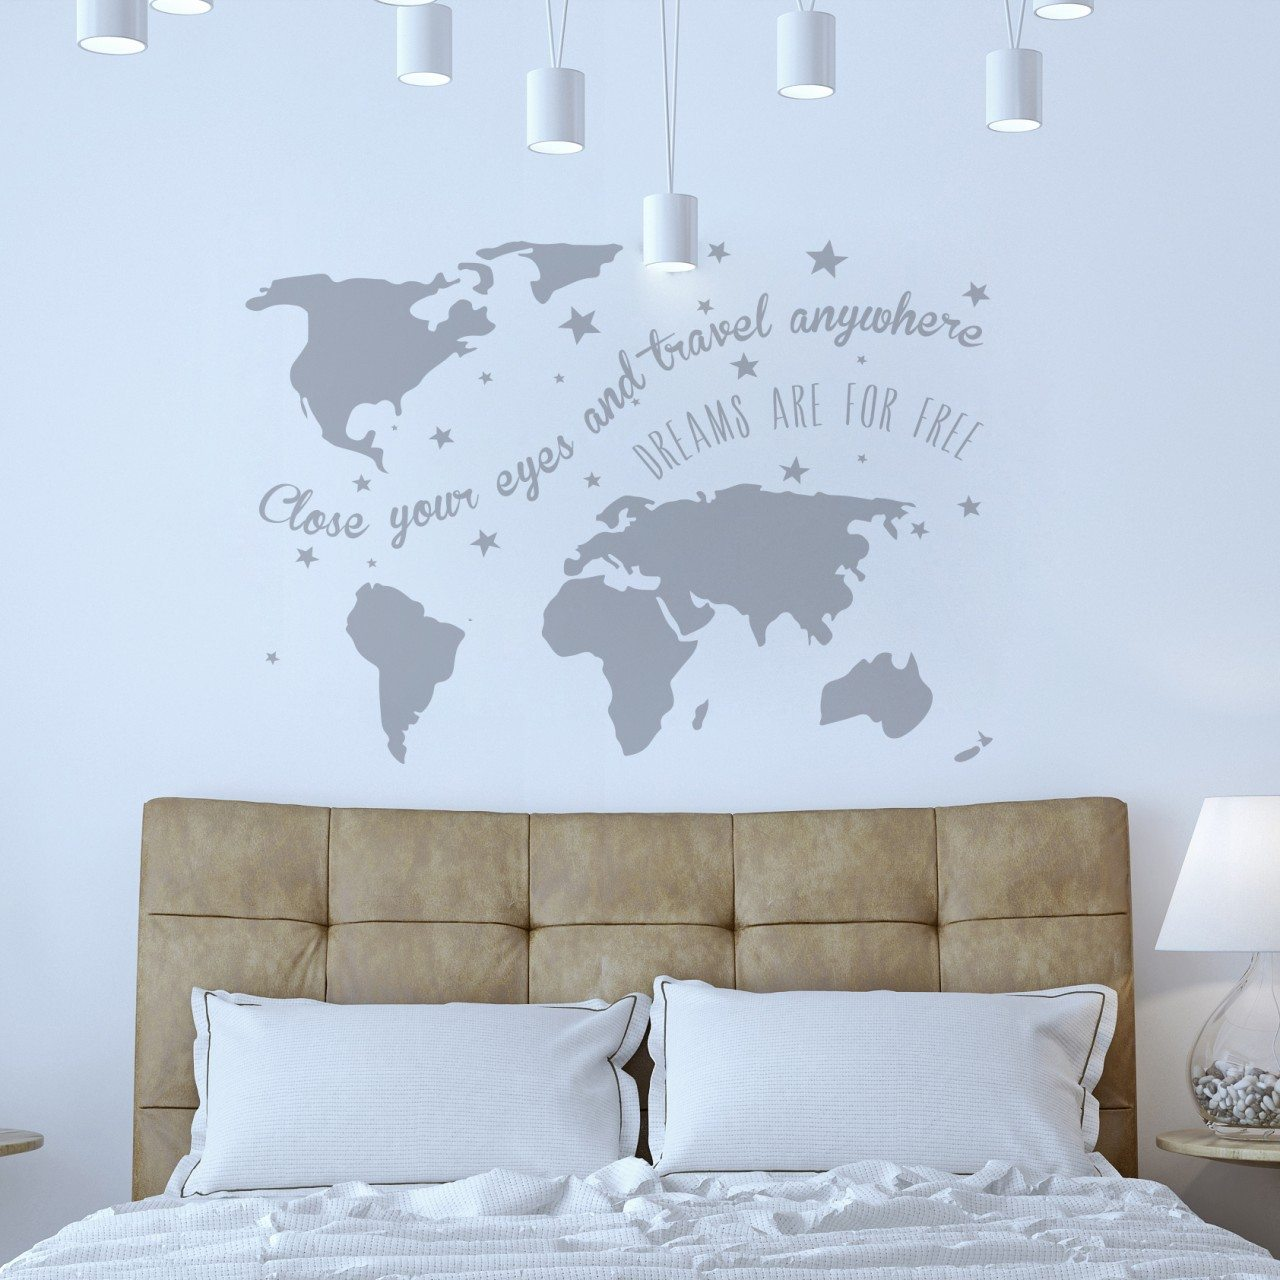 muursticker wereldkaart dreams2 - Muursticker Op Behang